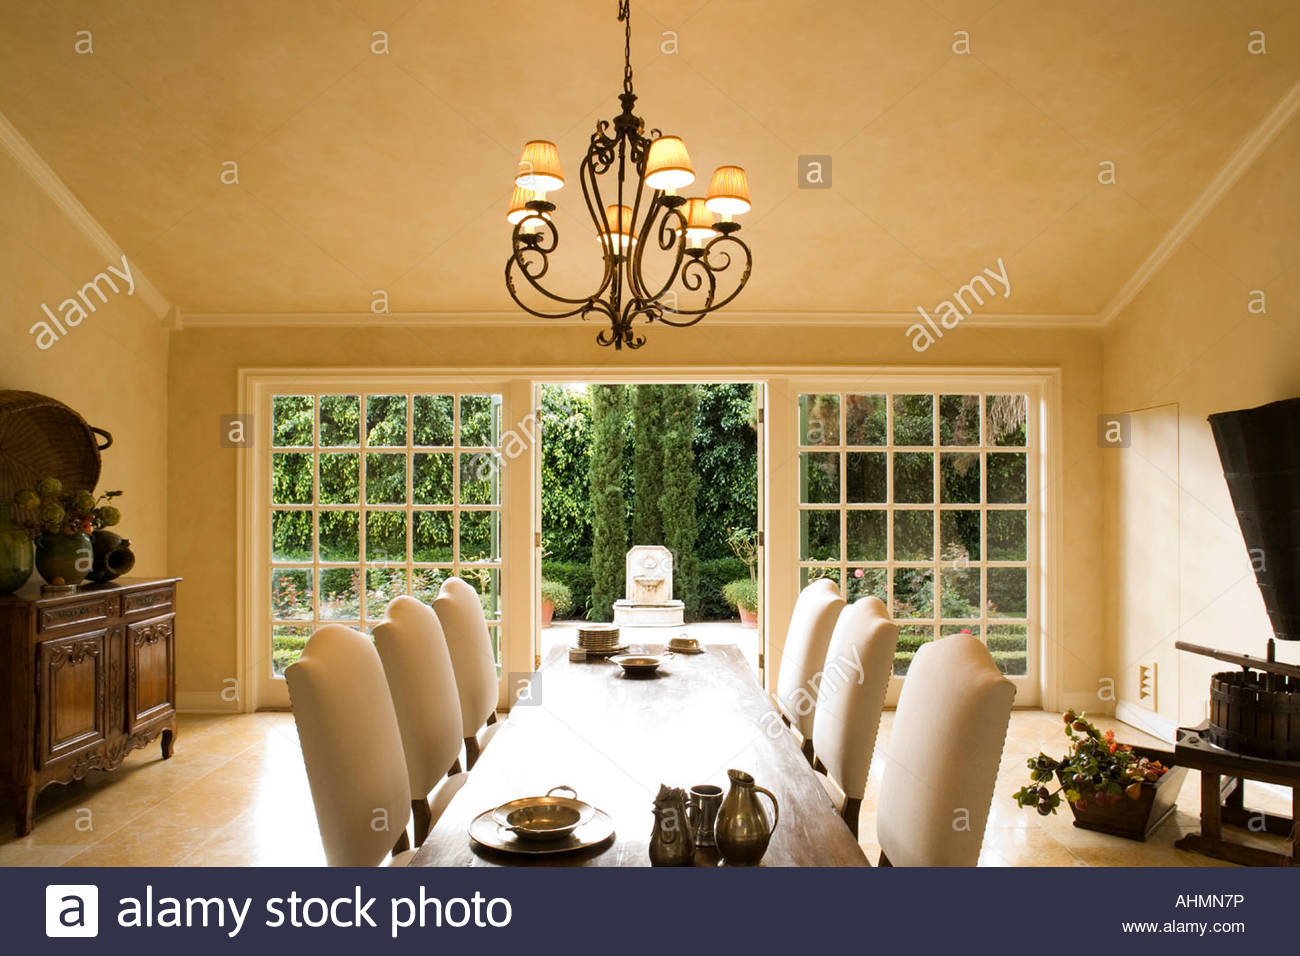 Large Elegant Tuscan Style Dining Room Stock Photo: 14508009 ...